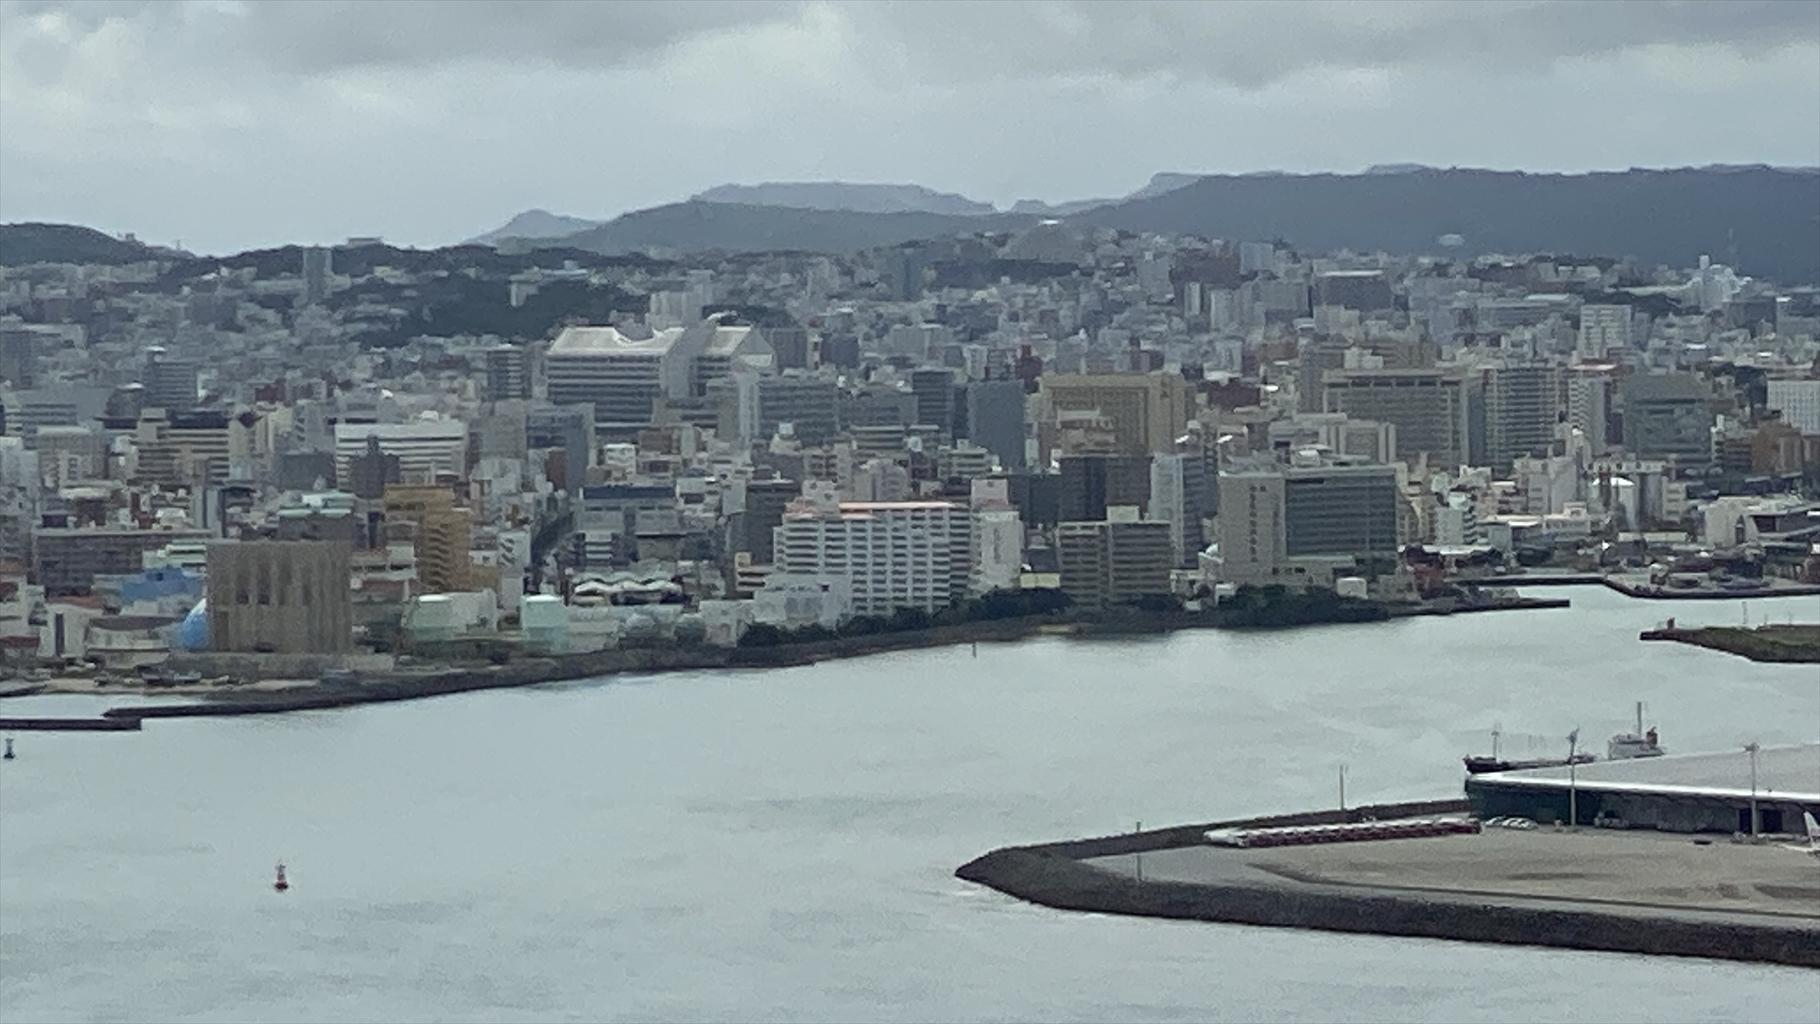 NU043 02JUN21 中部(名古屋)~沖縄(那覇) クラスJ